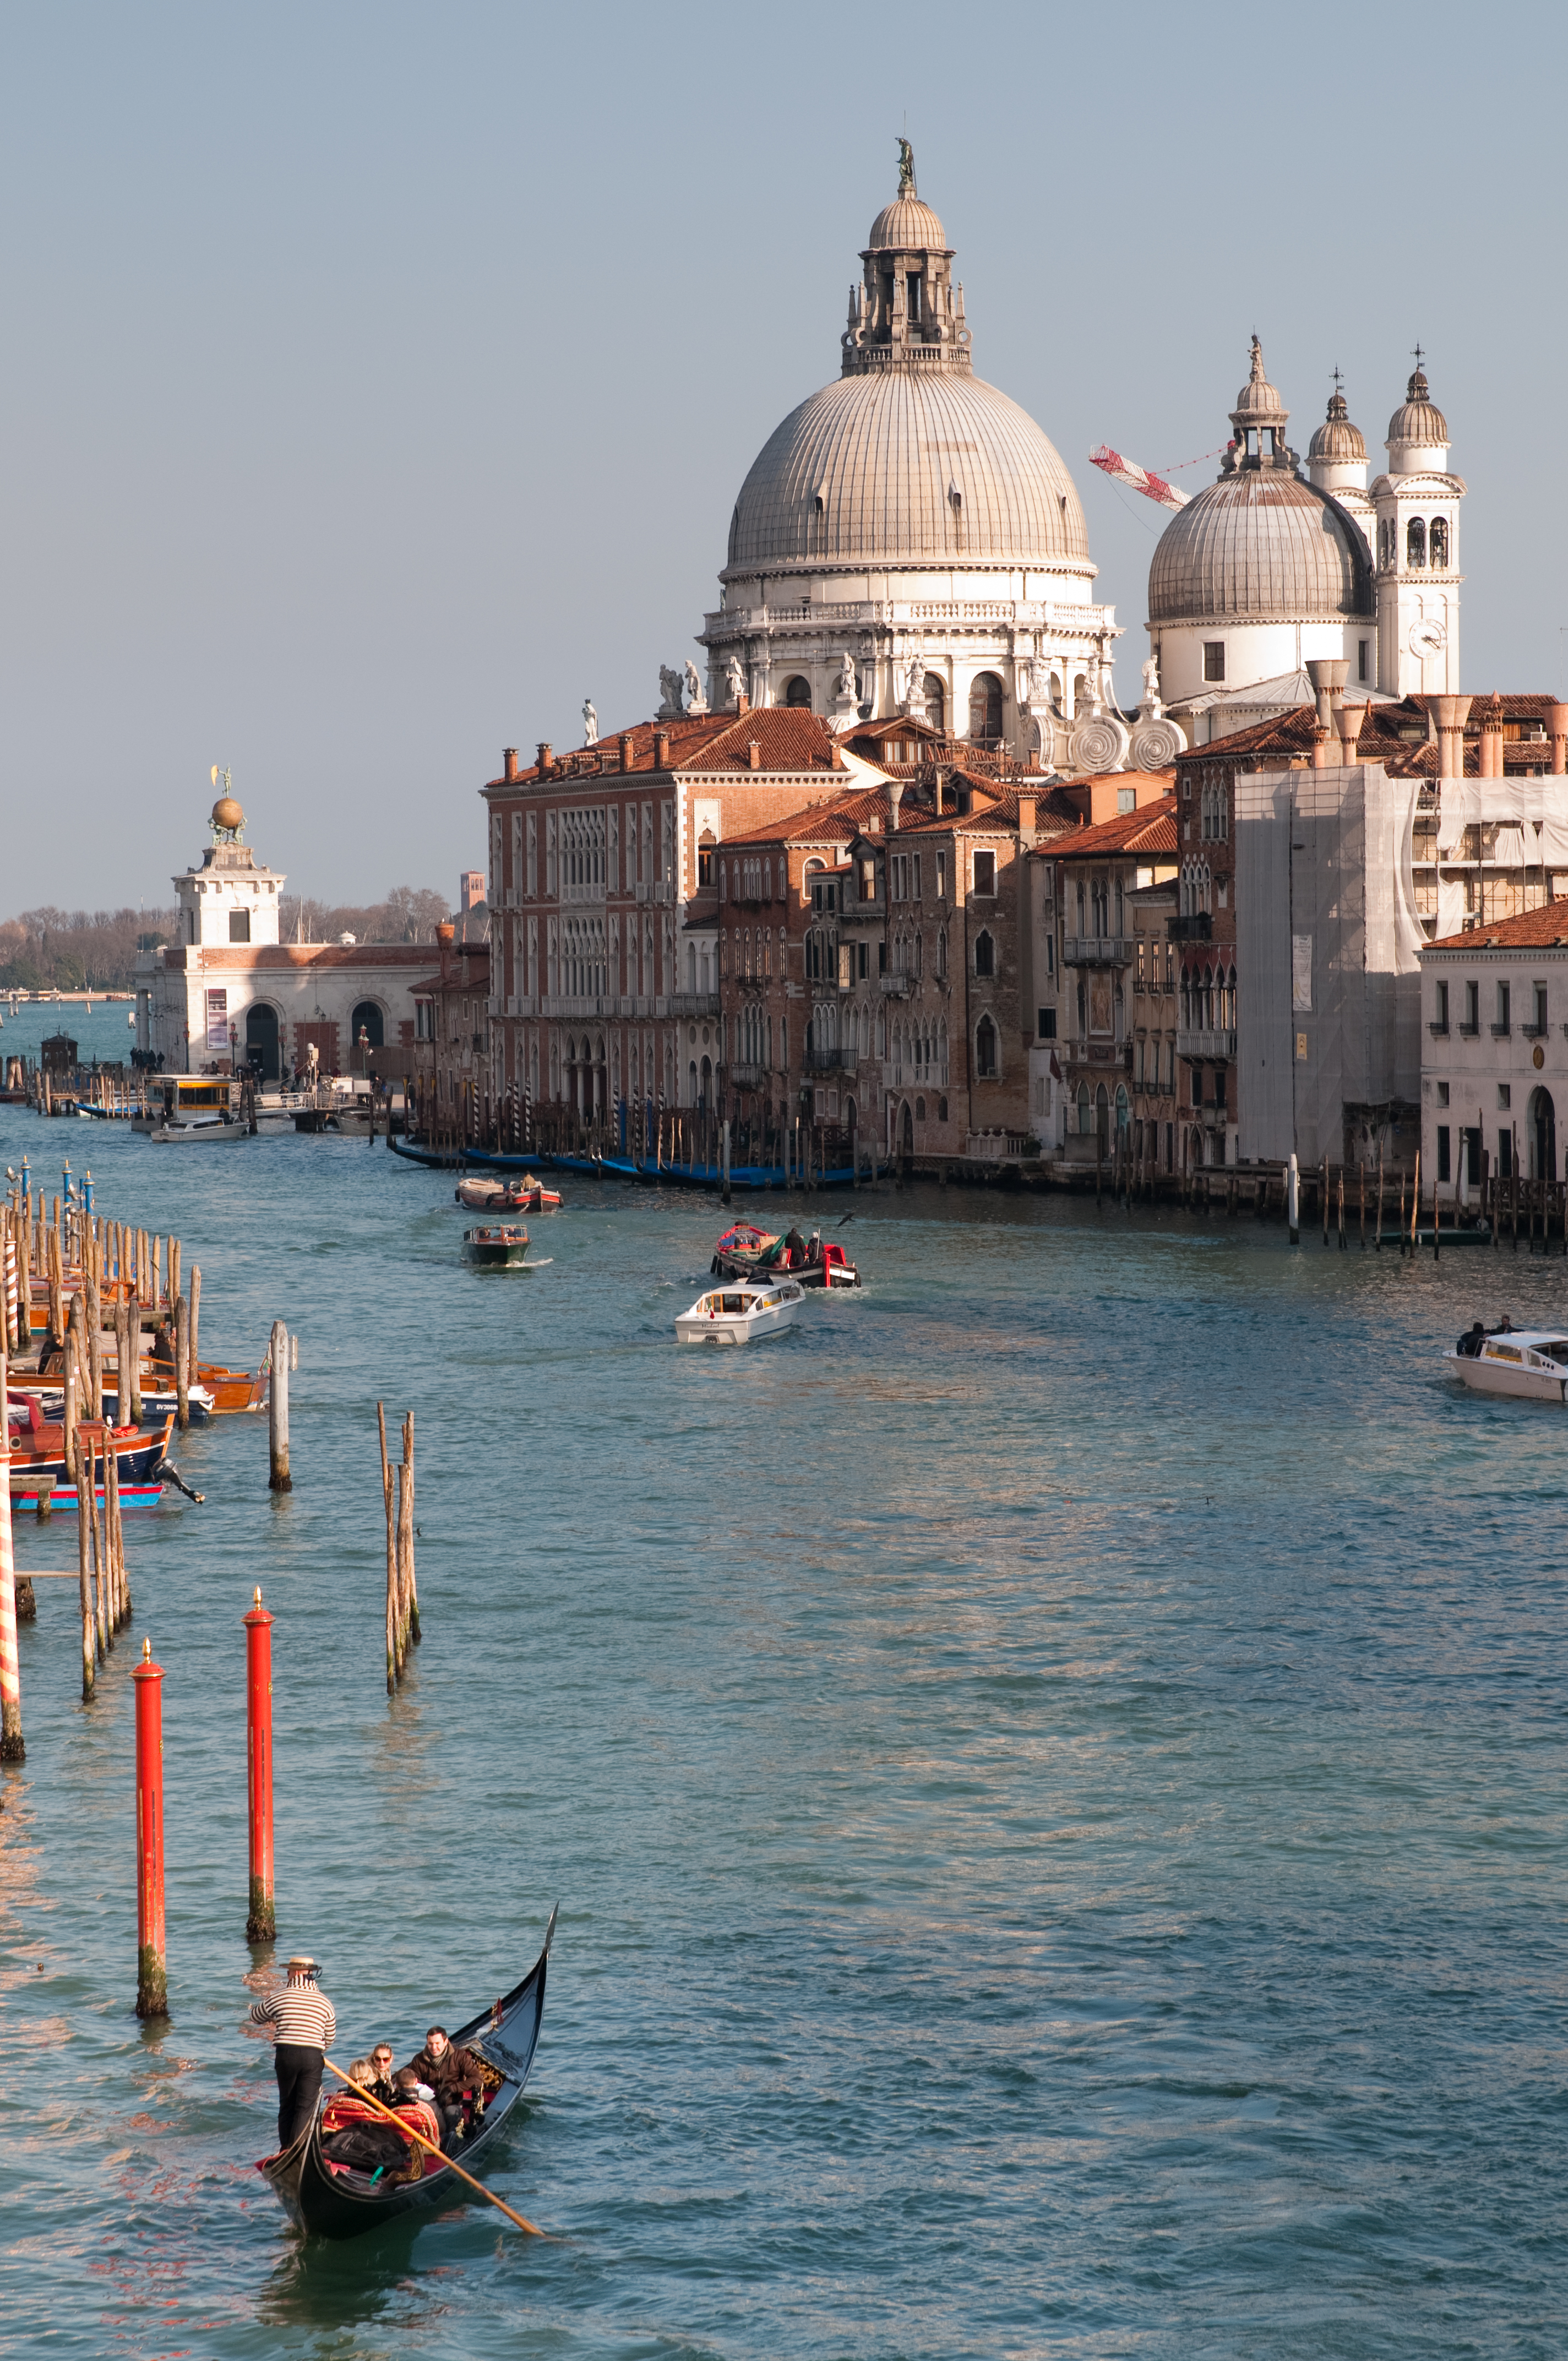 Venezia_5540223603_o